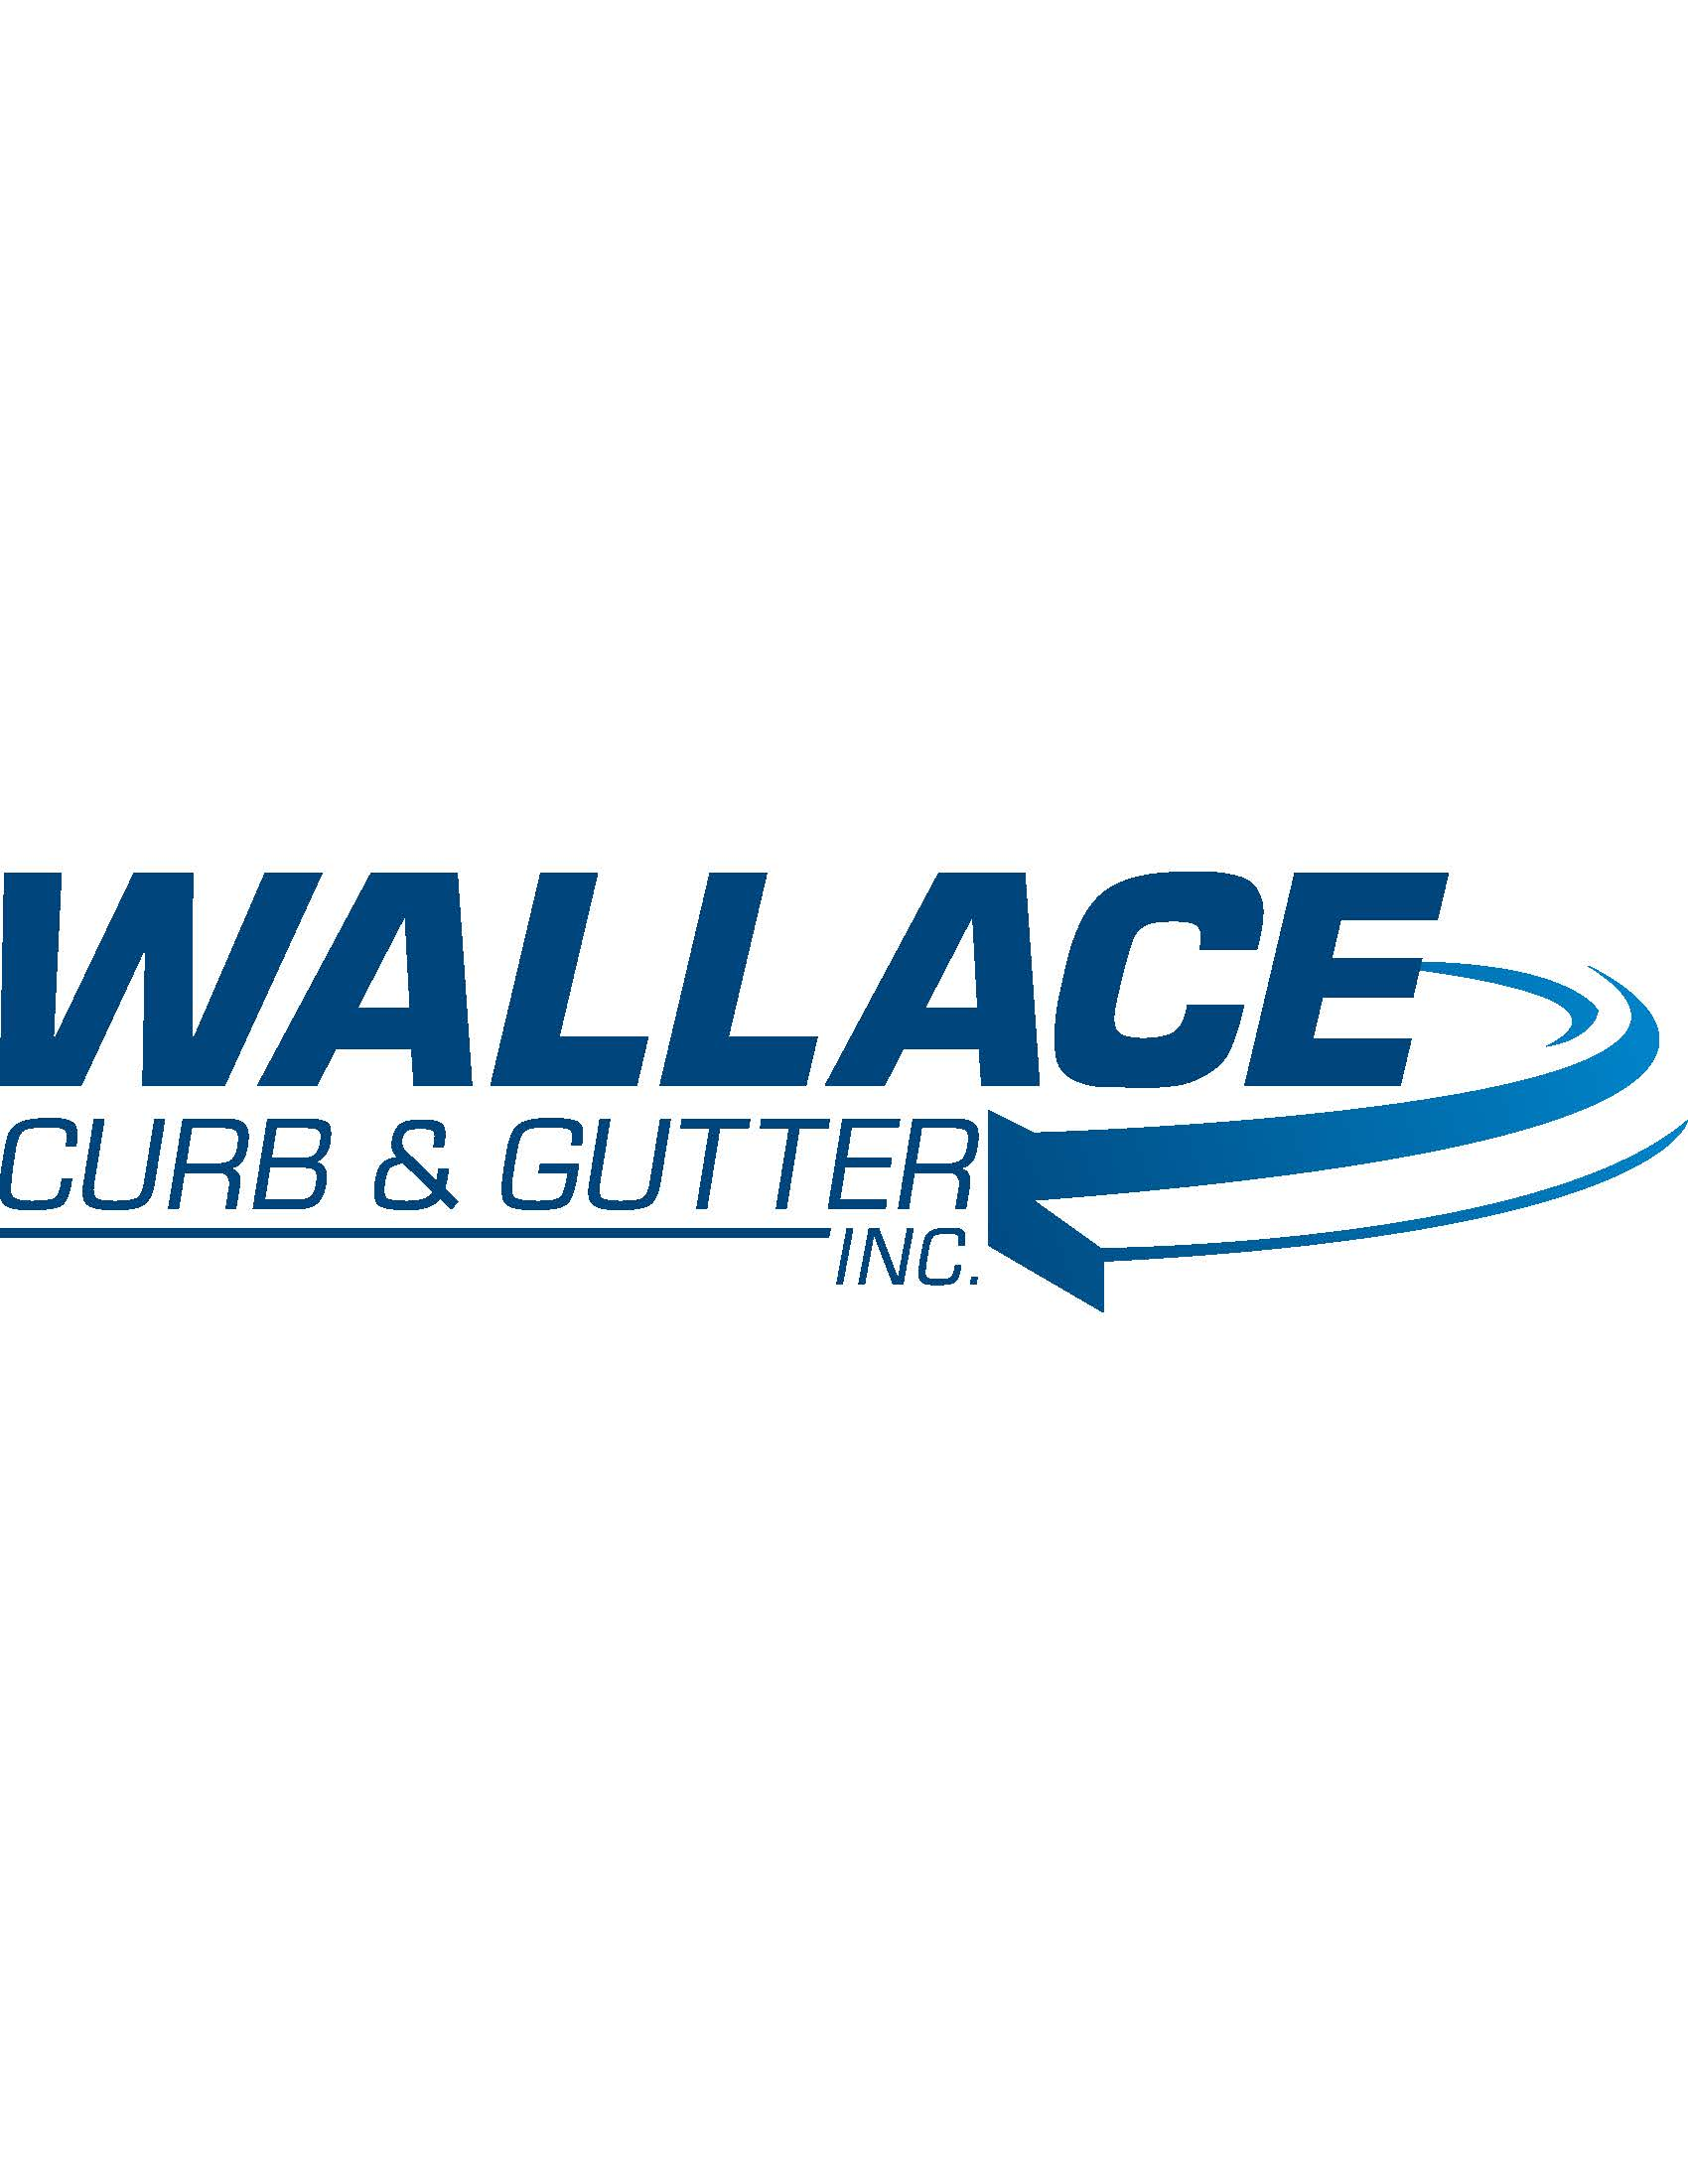 Wallace Curb & Gutter